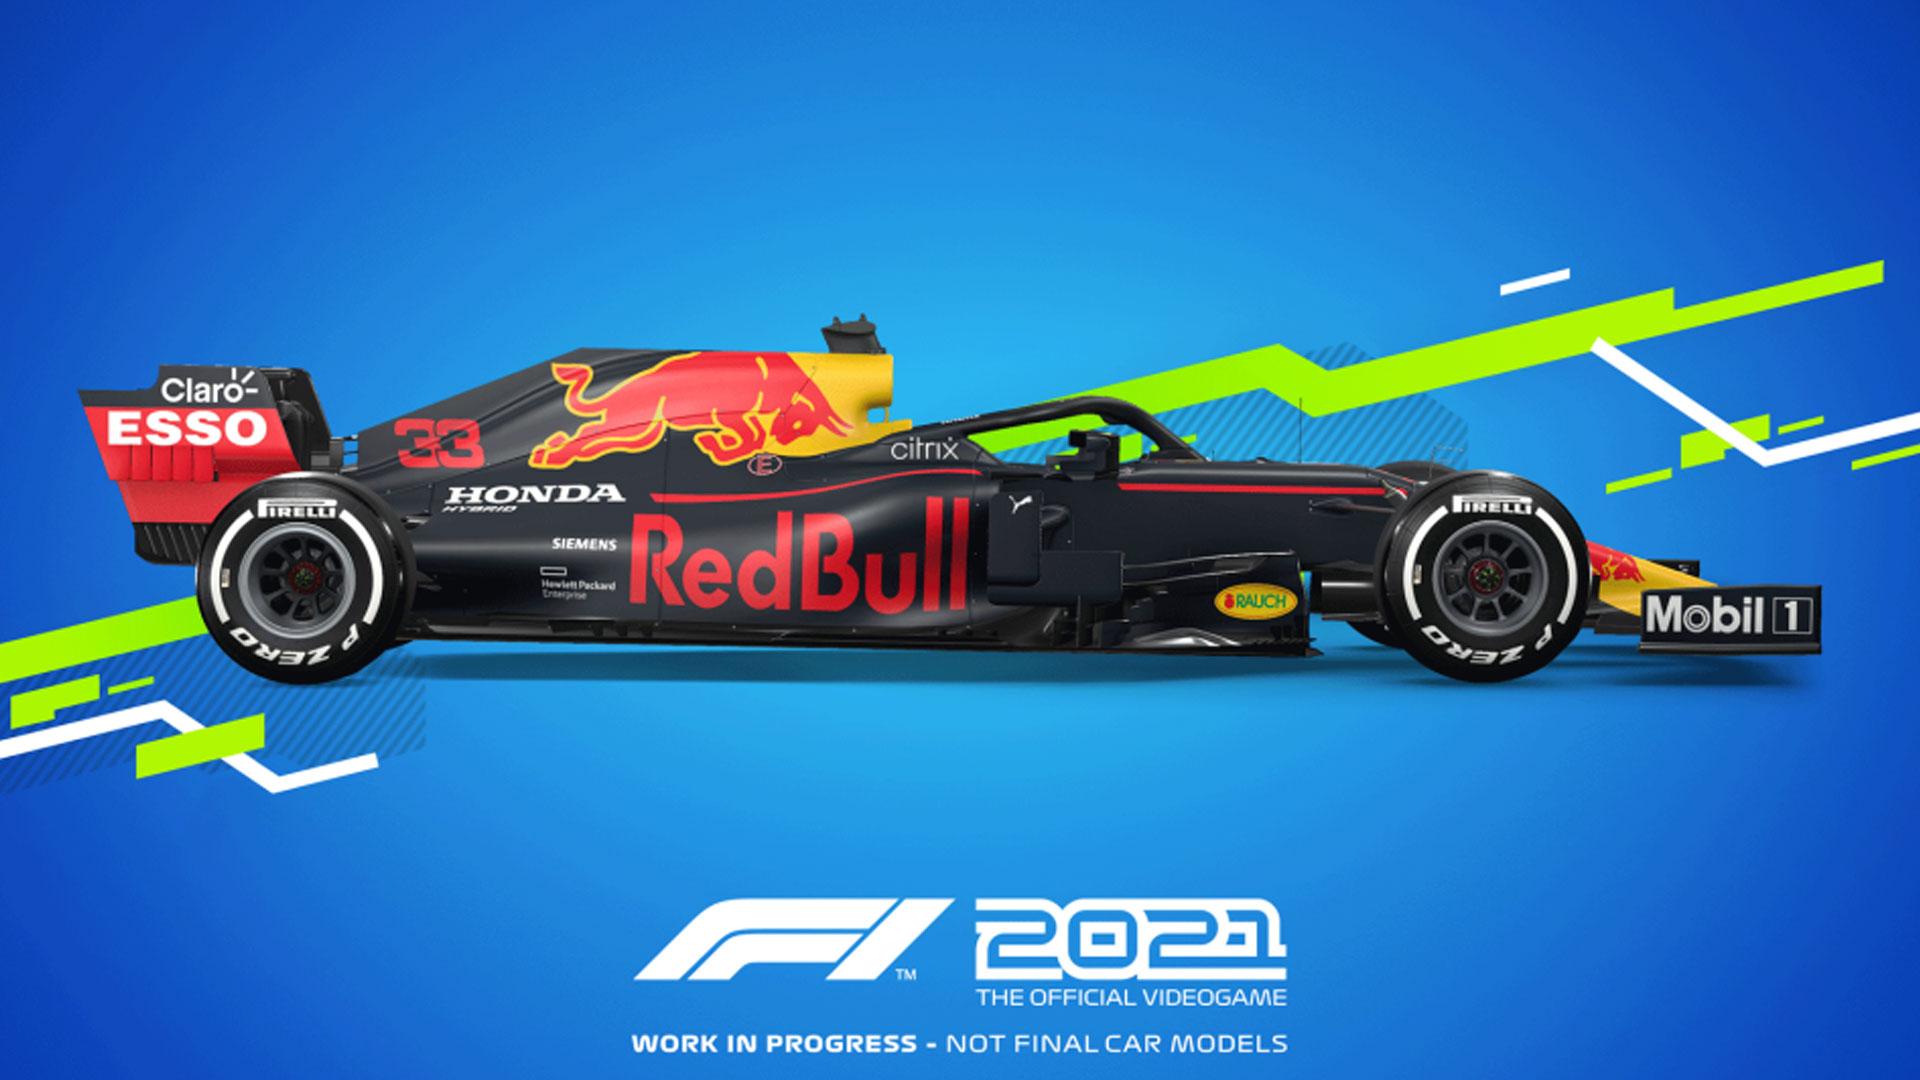 Releasedatum F1 2021: 16 juli 2021